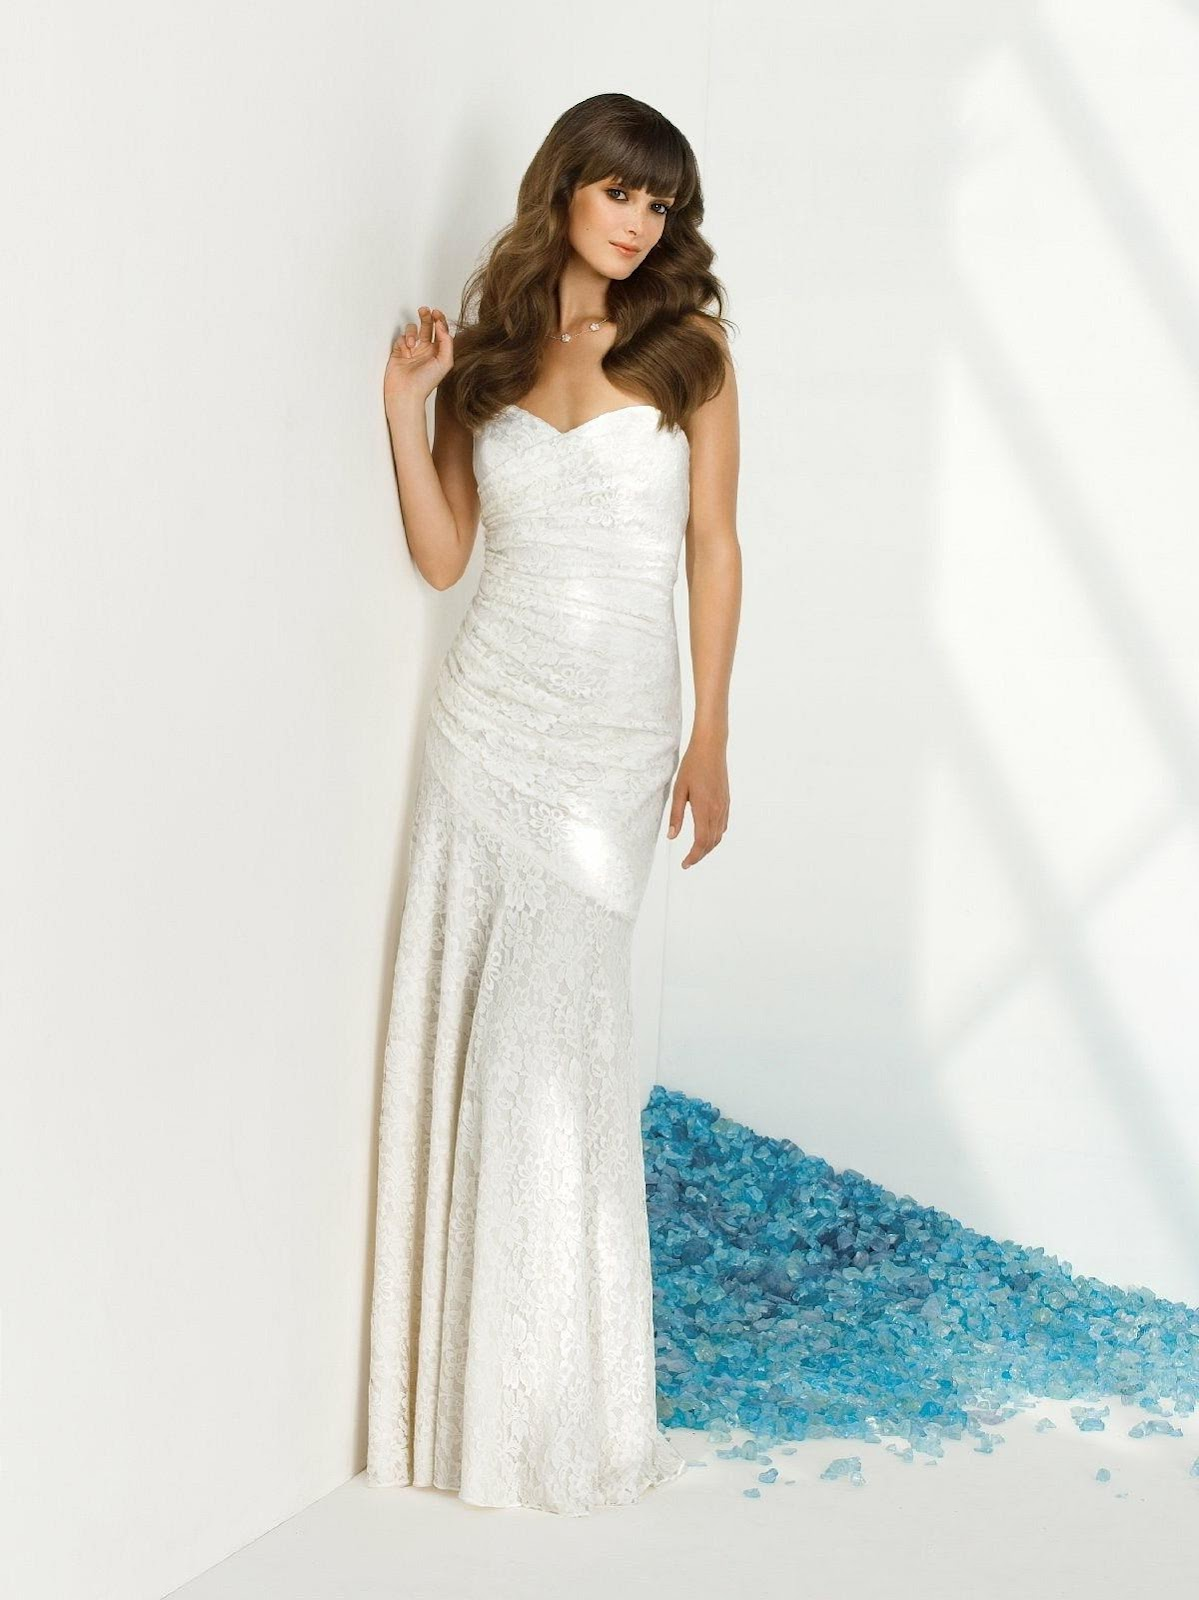 Sheath Column Strapless Sweetheart Sweep Train Lace Wedding Dress with